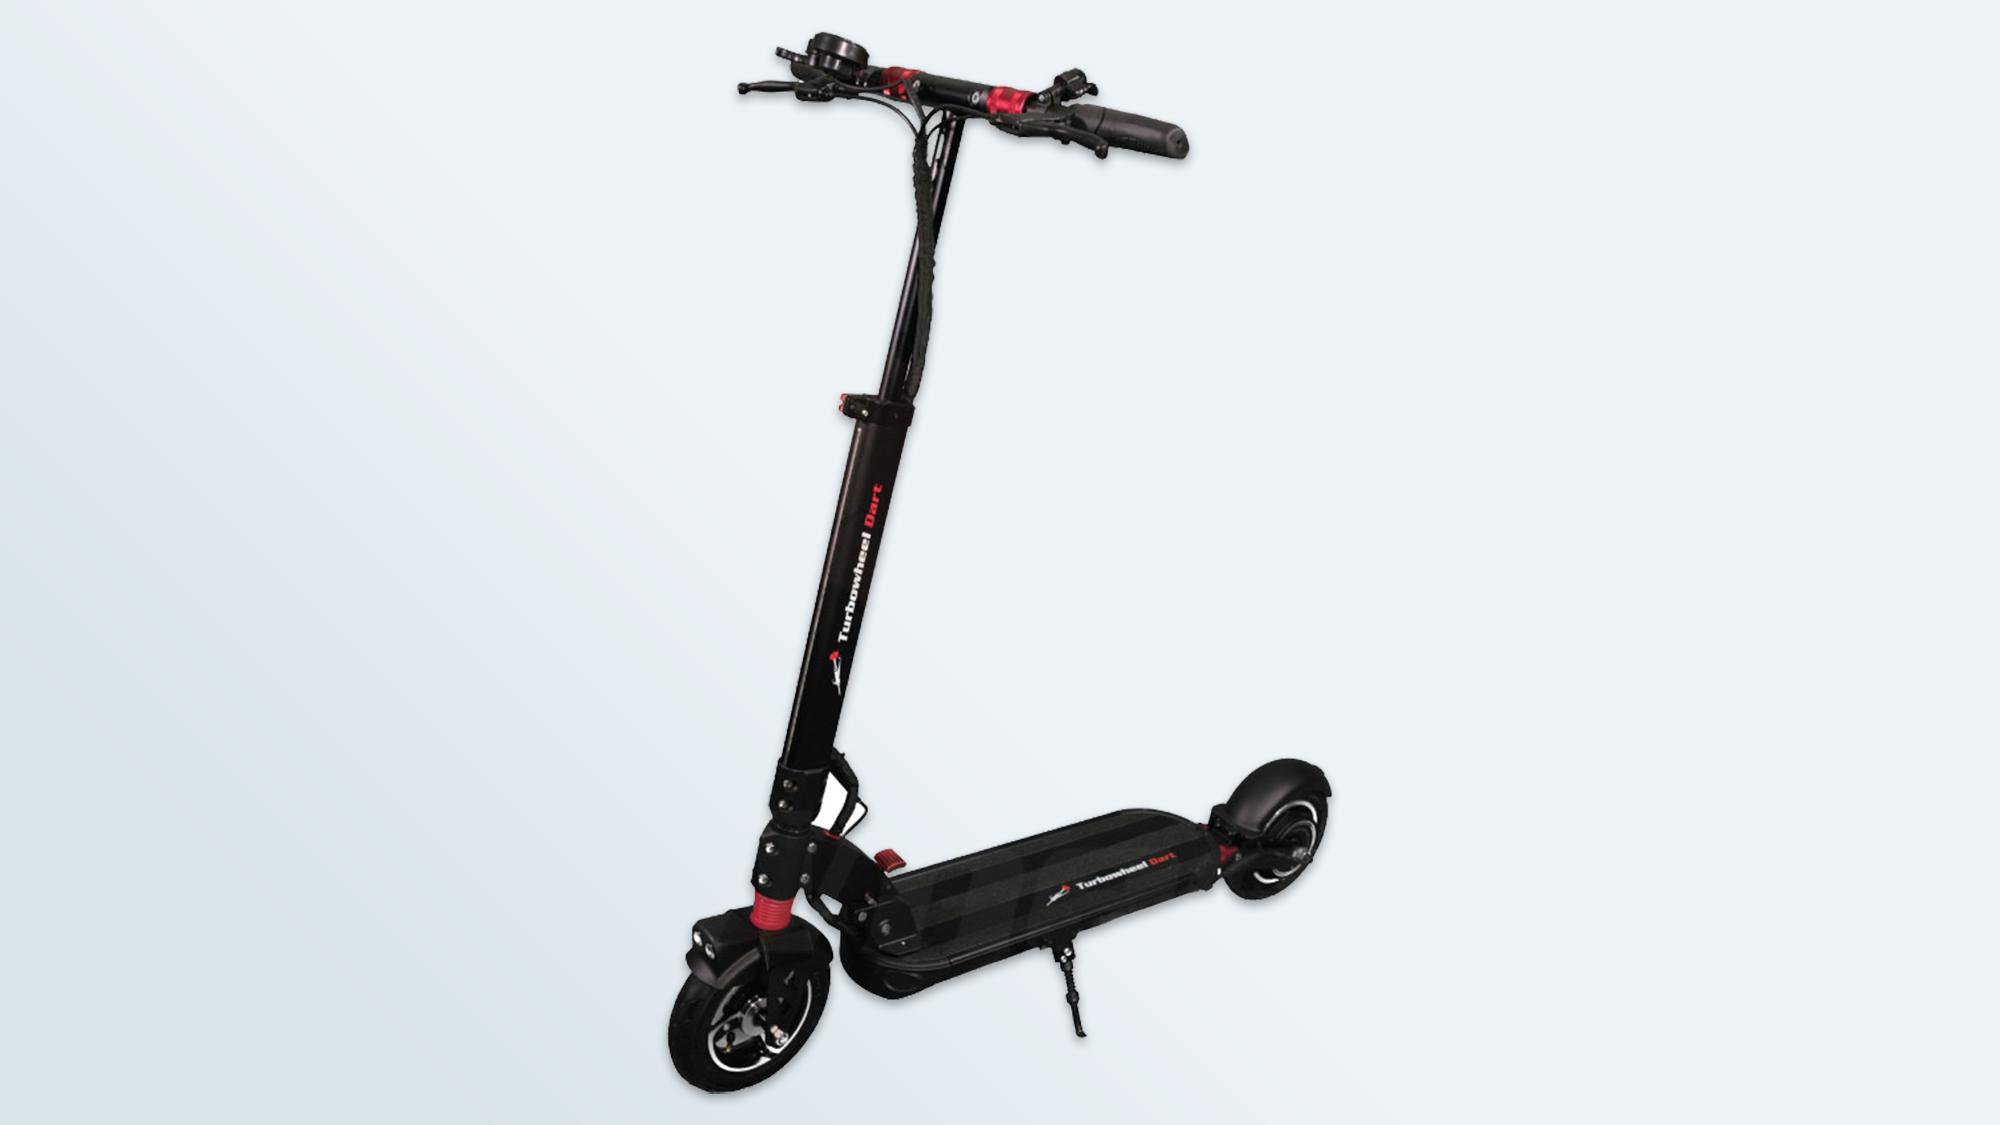 Melhores scooters elétricas: Turbowheel Dart T9